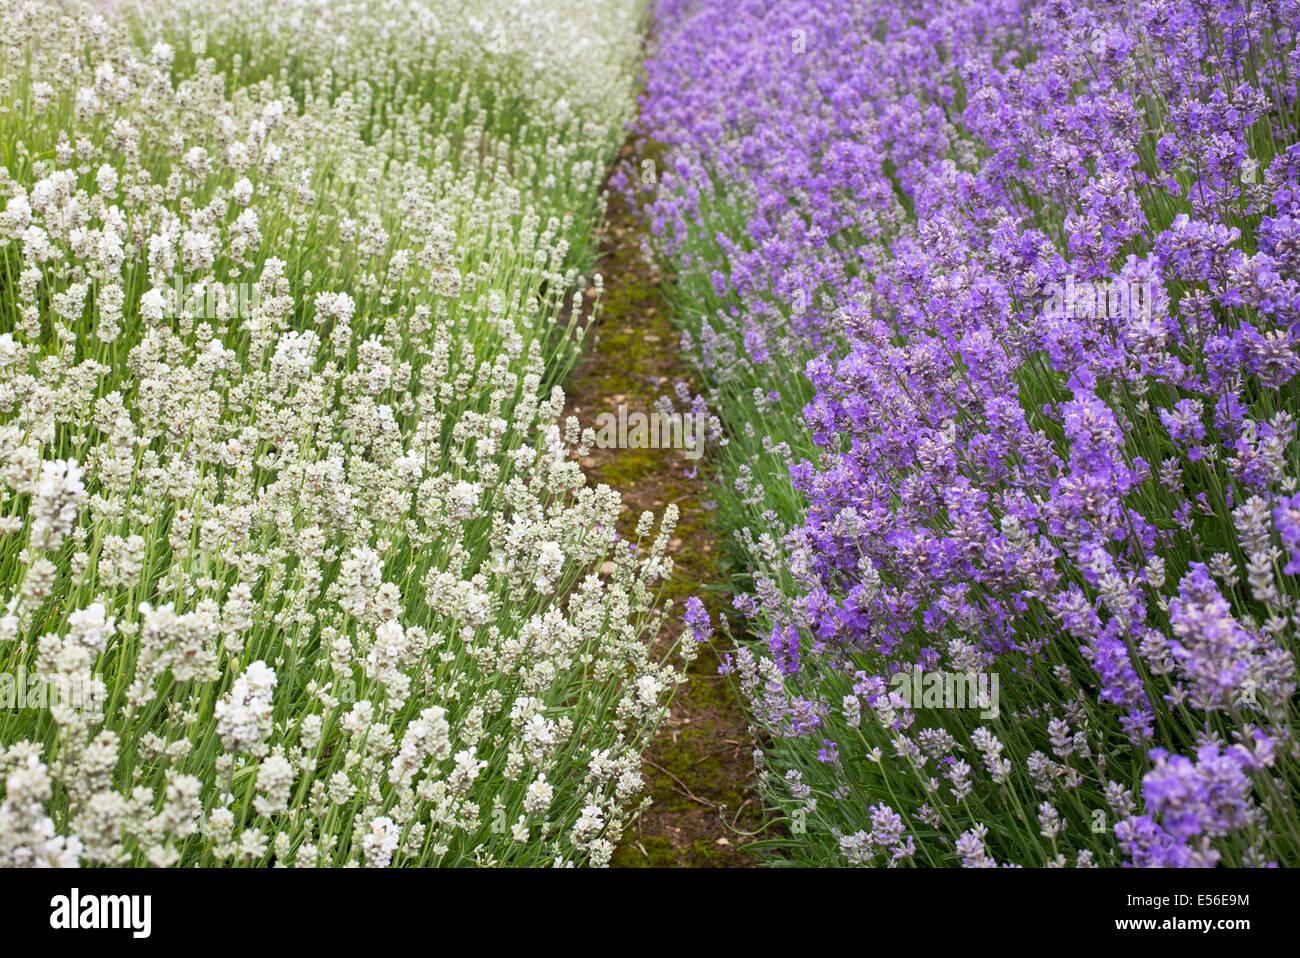 Lavandula Angustifolia. Lavender 'arctic snow' and 'cedar blue' at Snowshill farm Gloucestershire - Stock Image